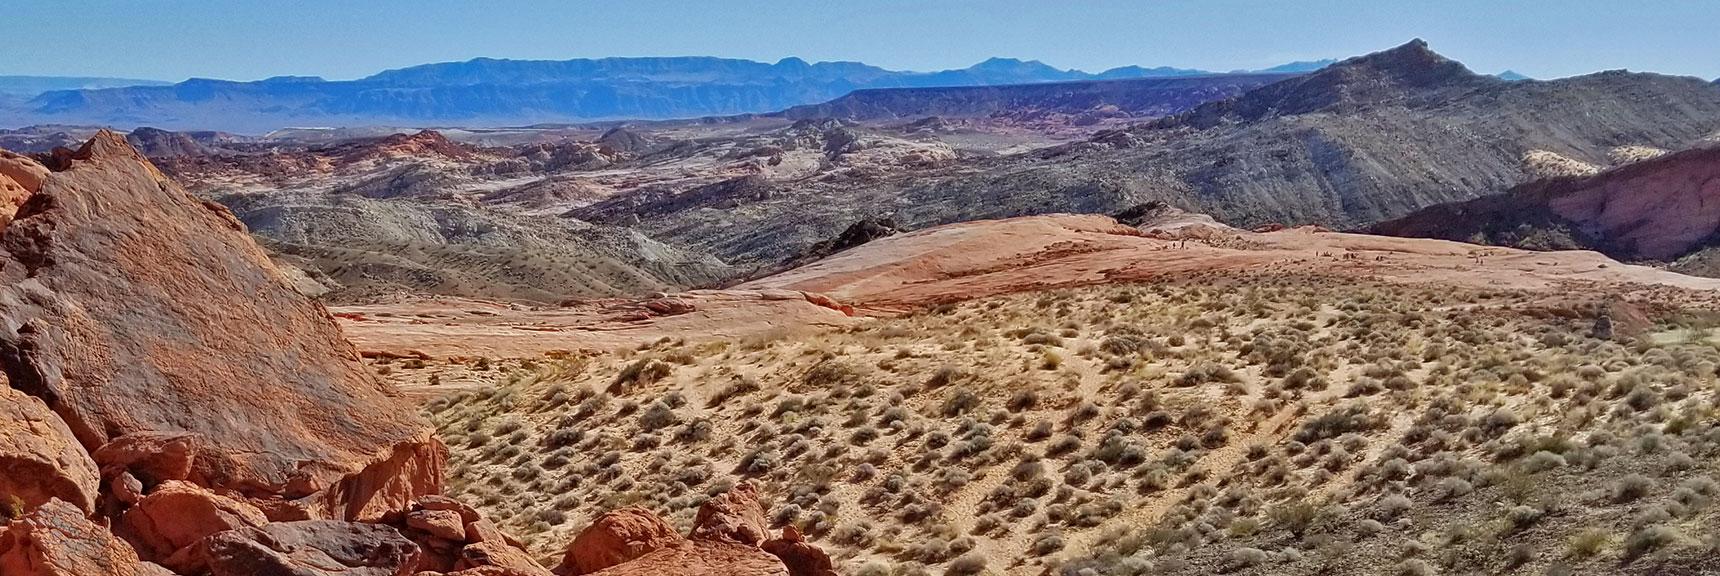 Firewave in Valley of Fire State Park, Nevada, Slide 005